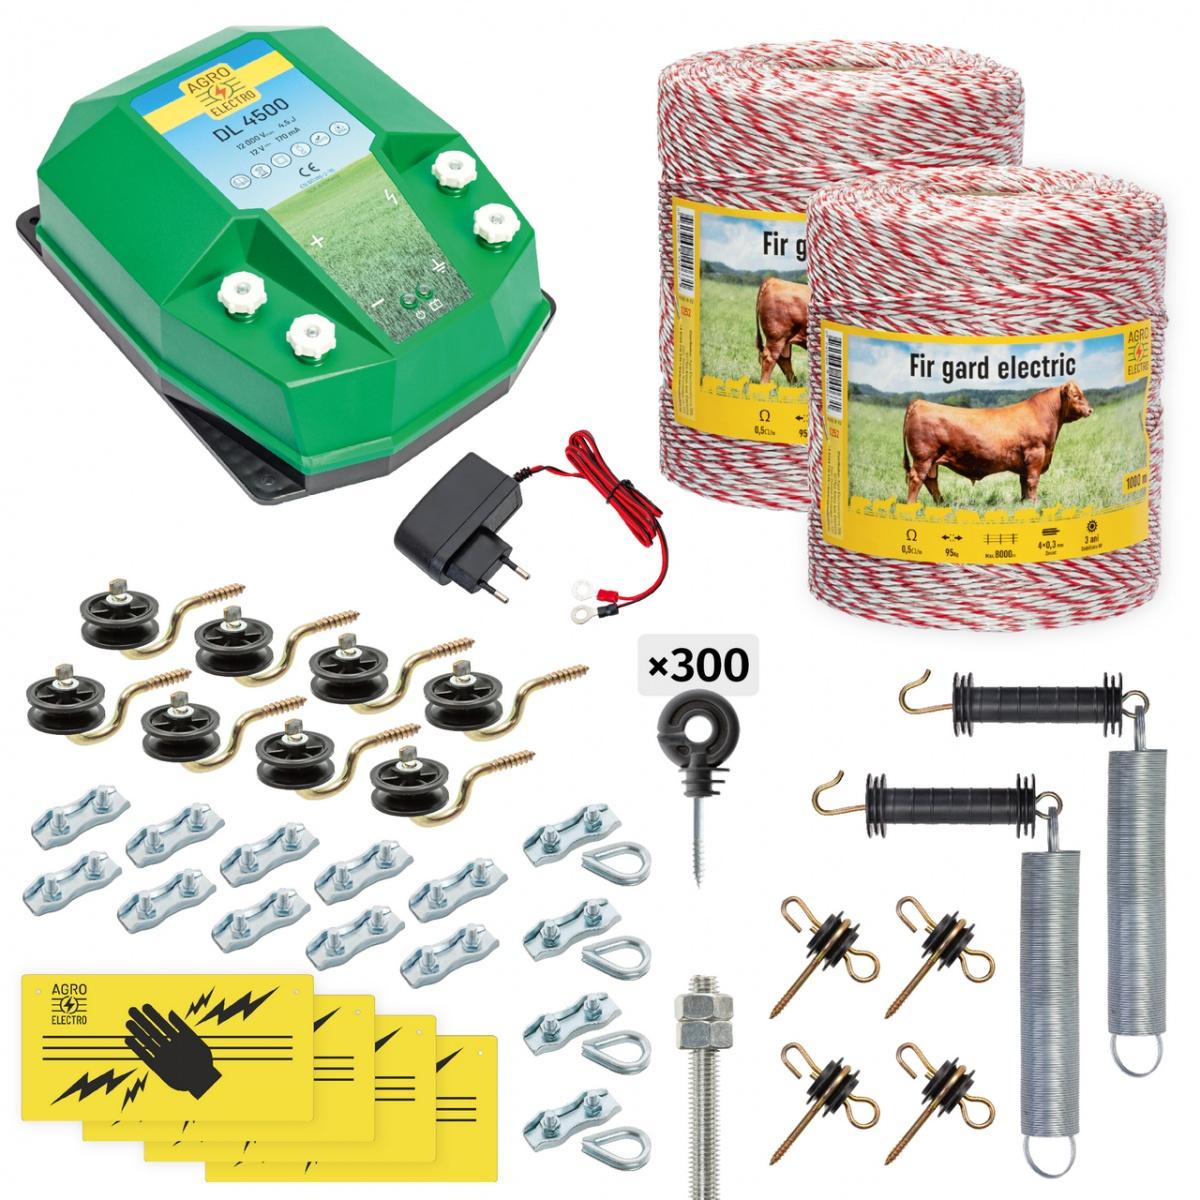 Pachet gard electric complet 2000m, 4,5 Joule, 230V, pentru animale domestice